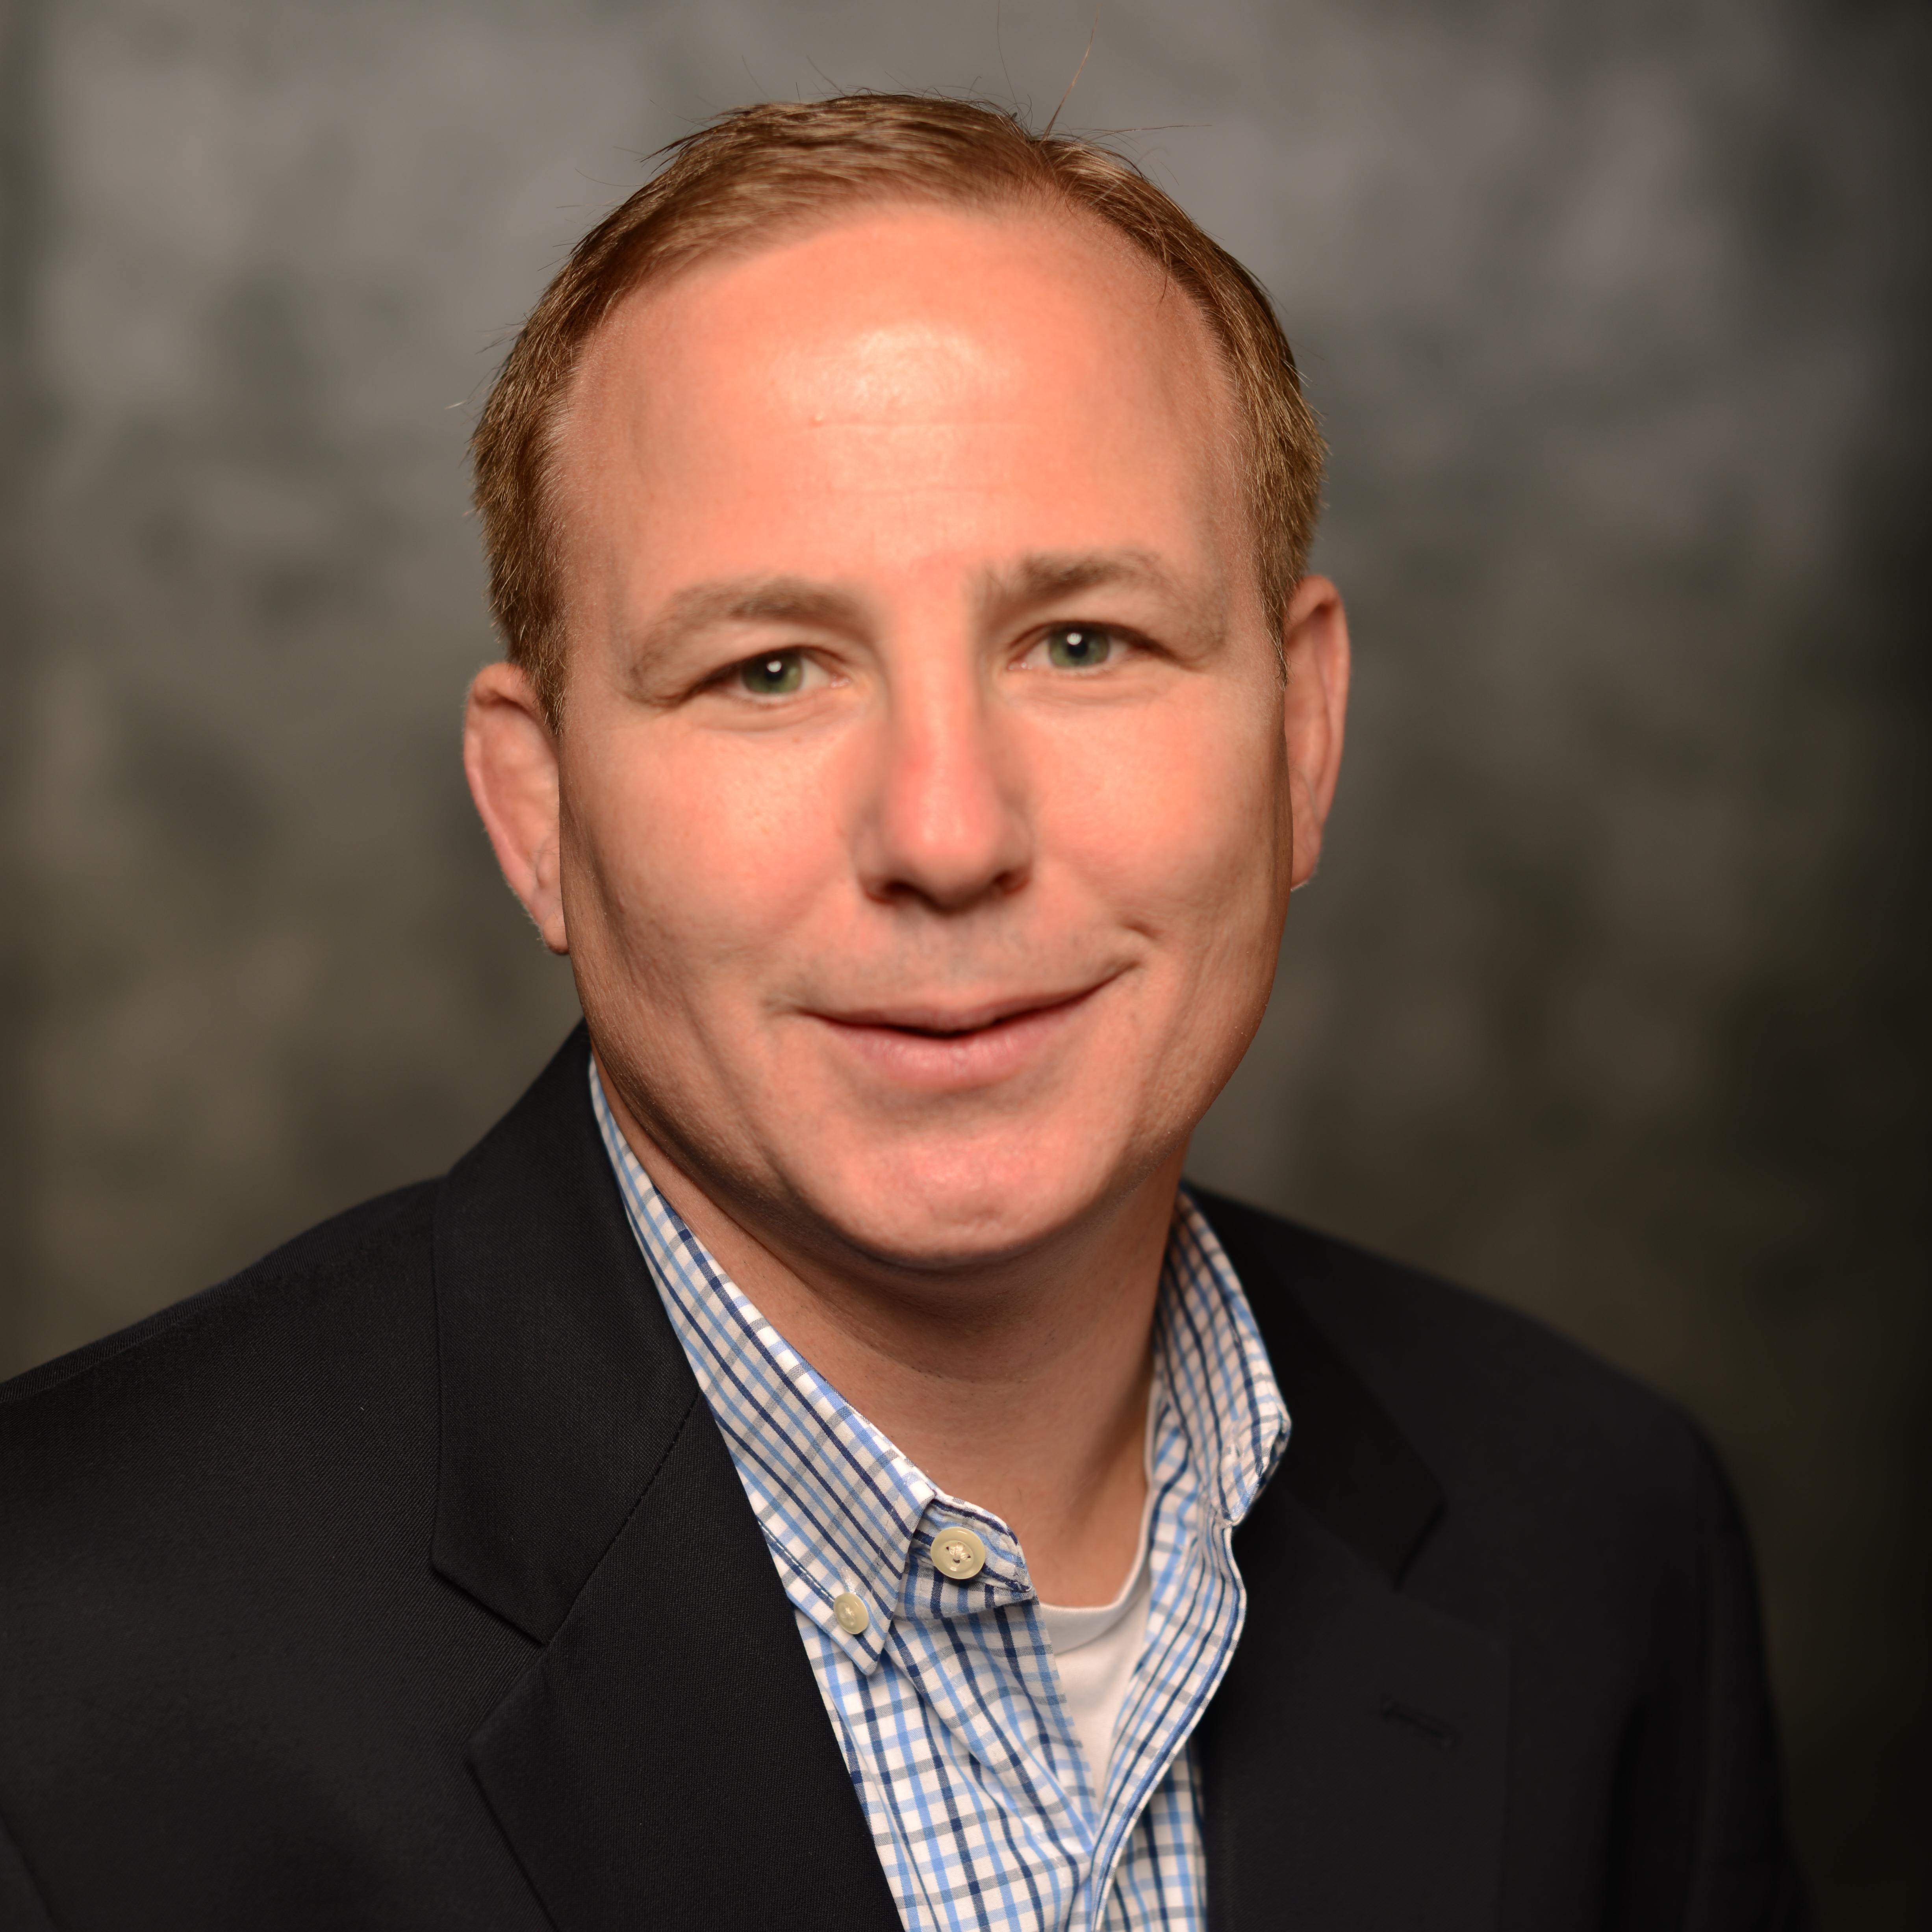 Tim Manning Headshot.JPG